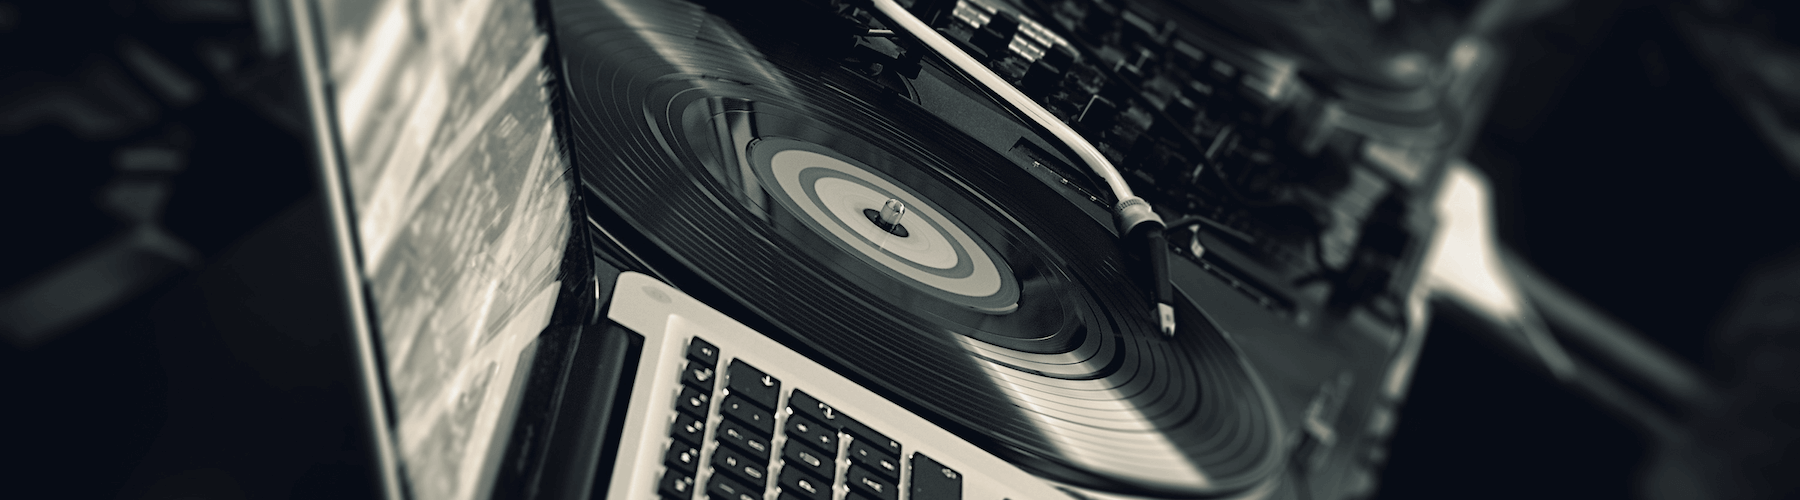 Musik Mischpult